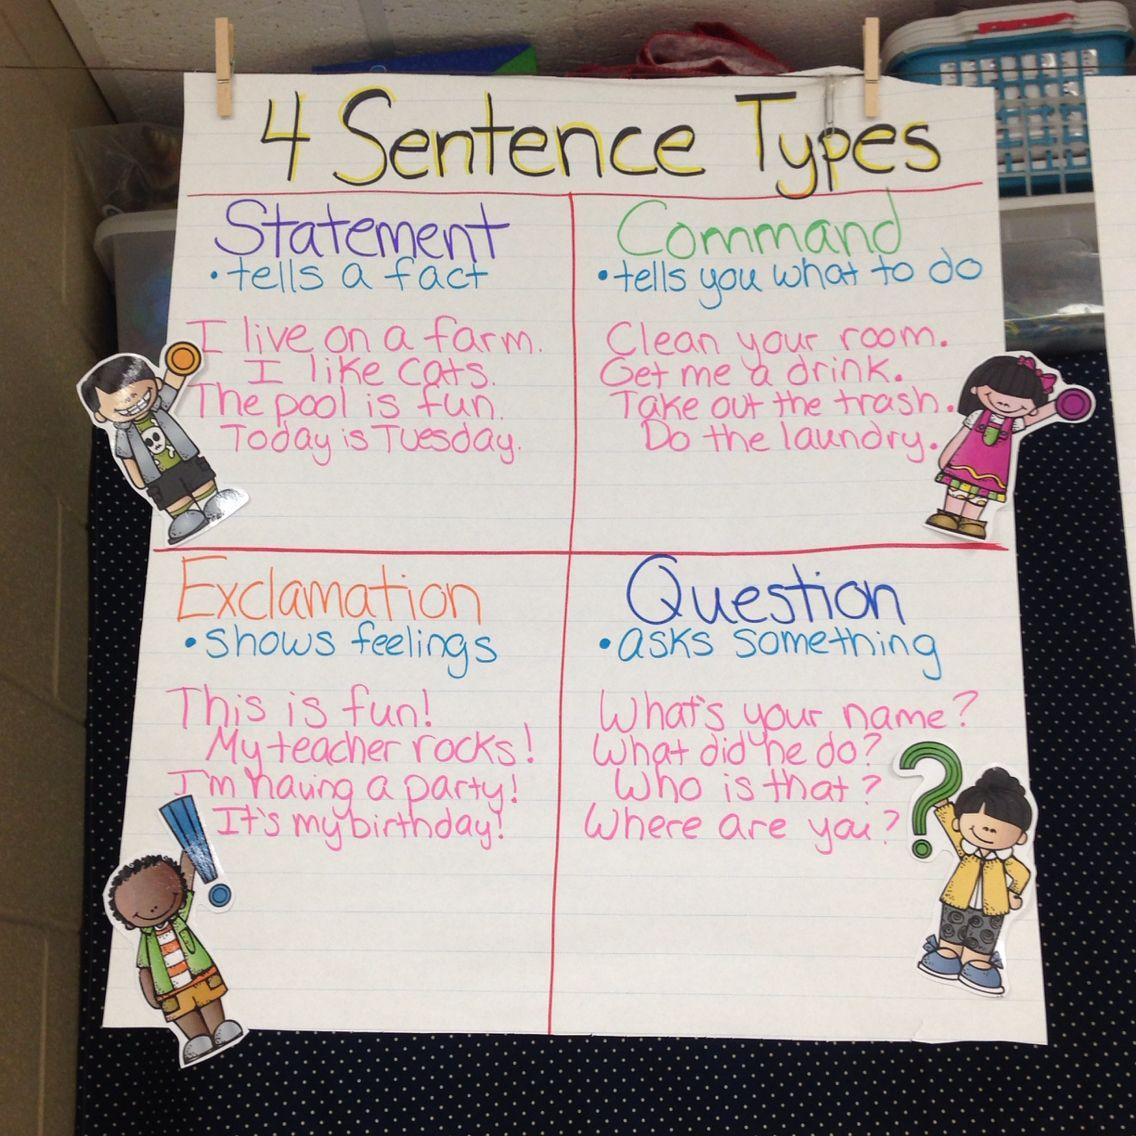 4 sentence types anchor chart